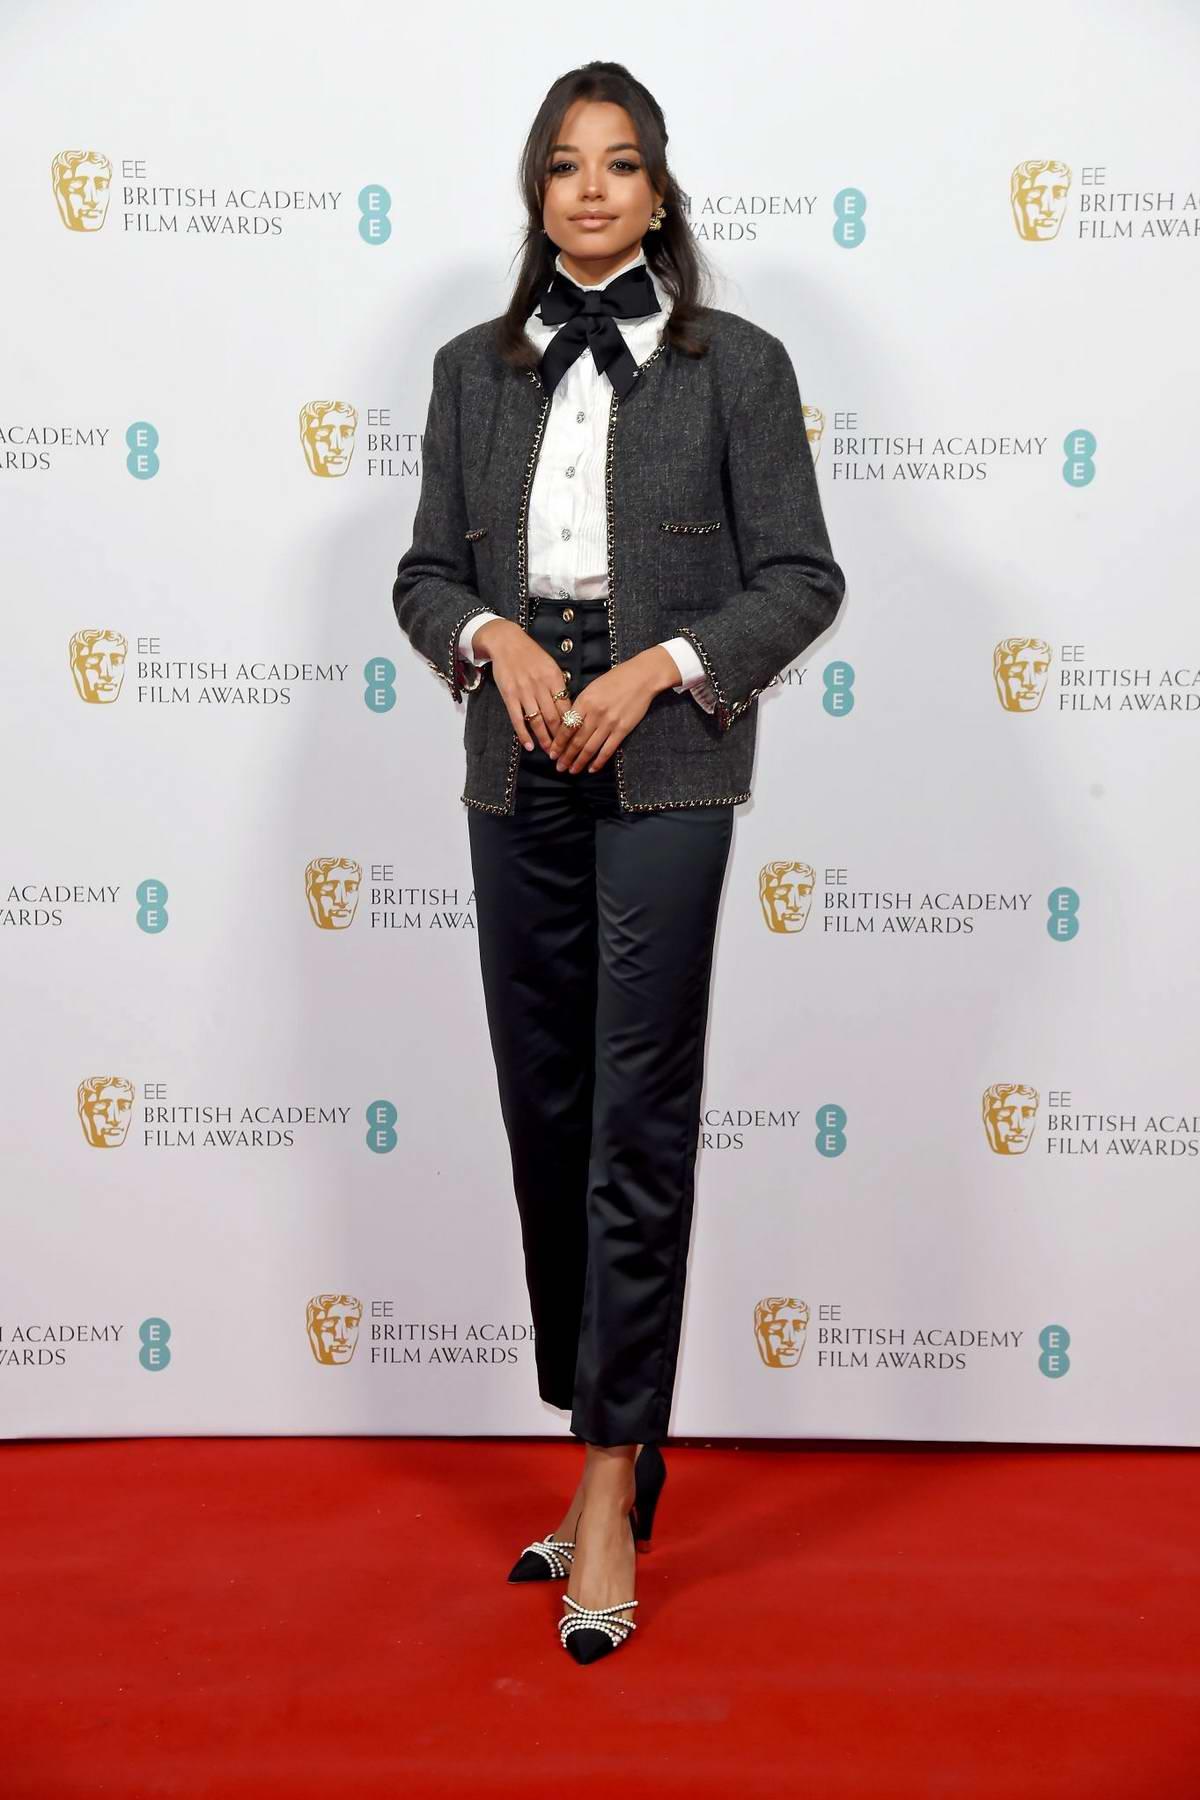 Ella Balinska attends the EE British Academy Film Awards 2020 Nominees Party in London, UK